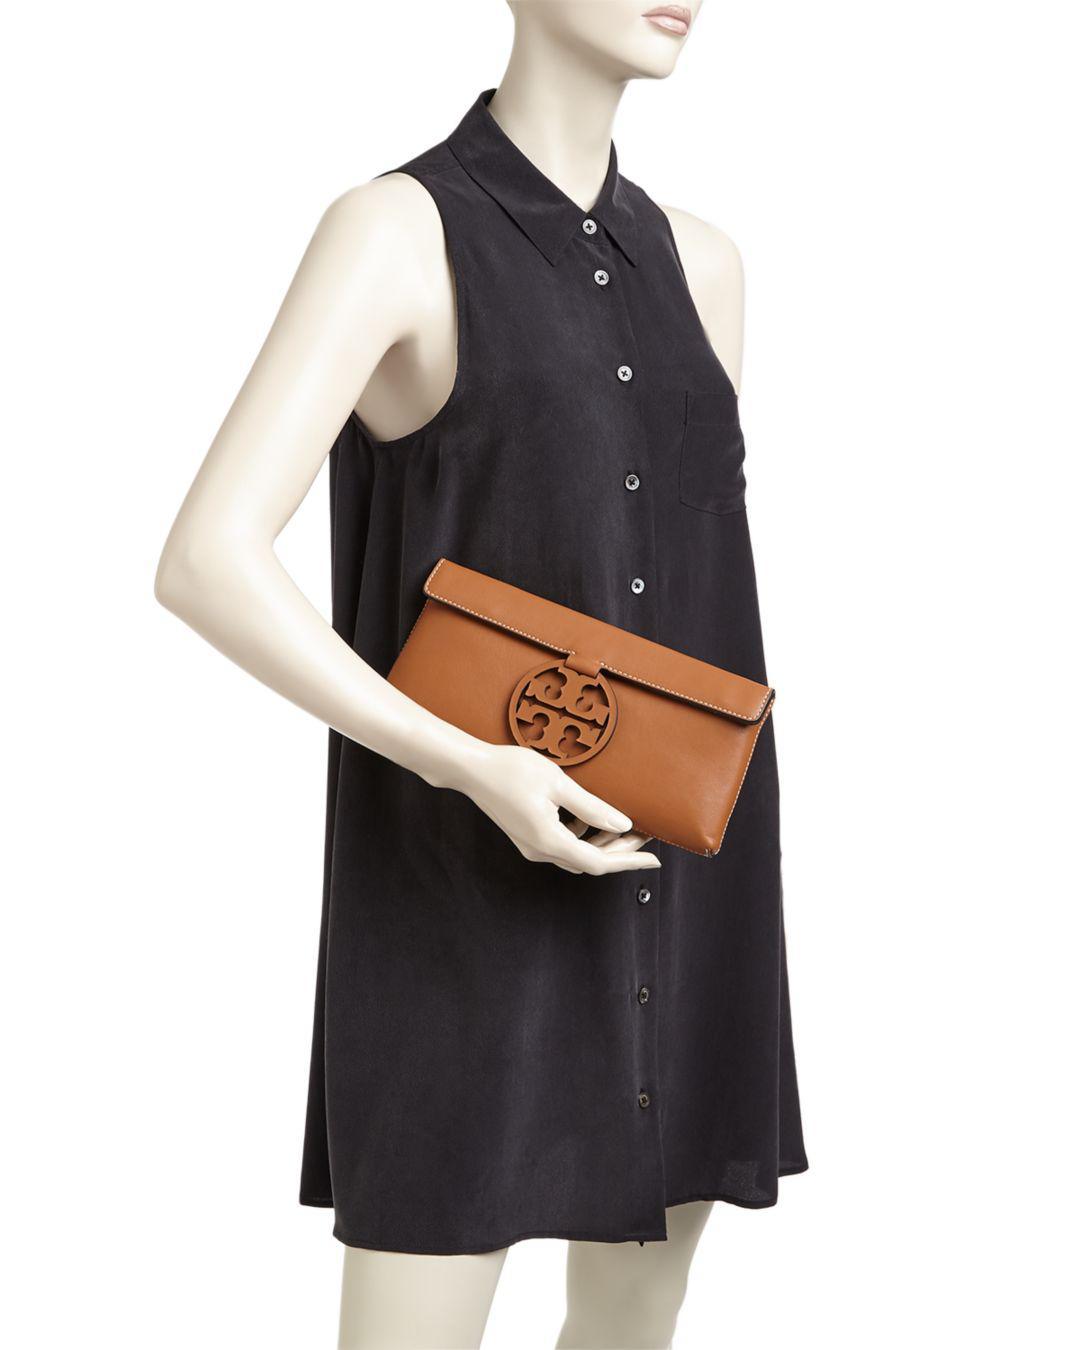 07775d9dd9fc Lyst - Tory Burch Miller Leather Clutch in Black